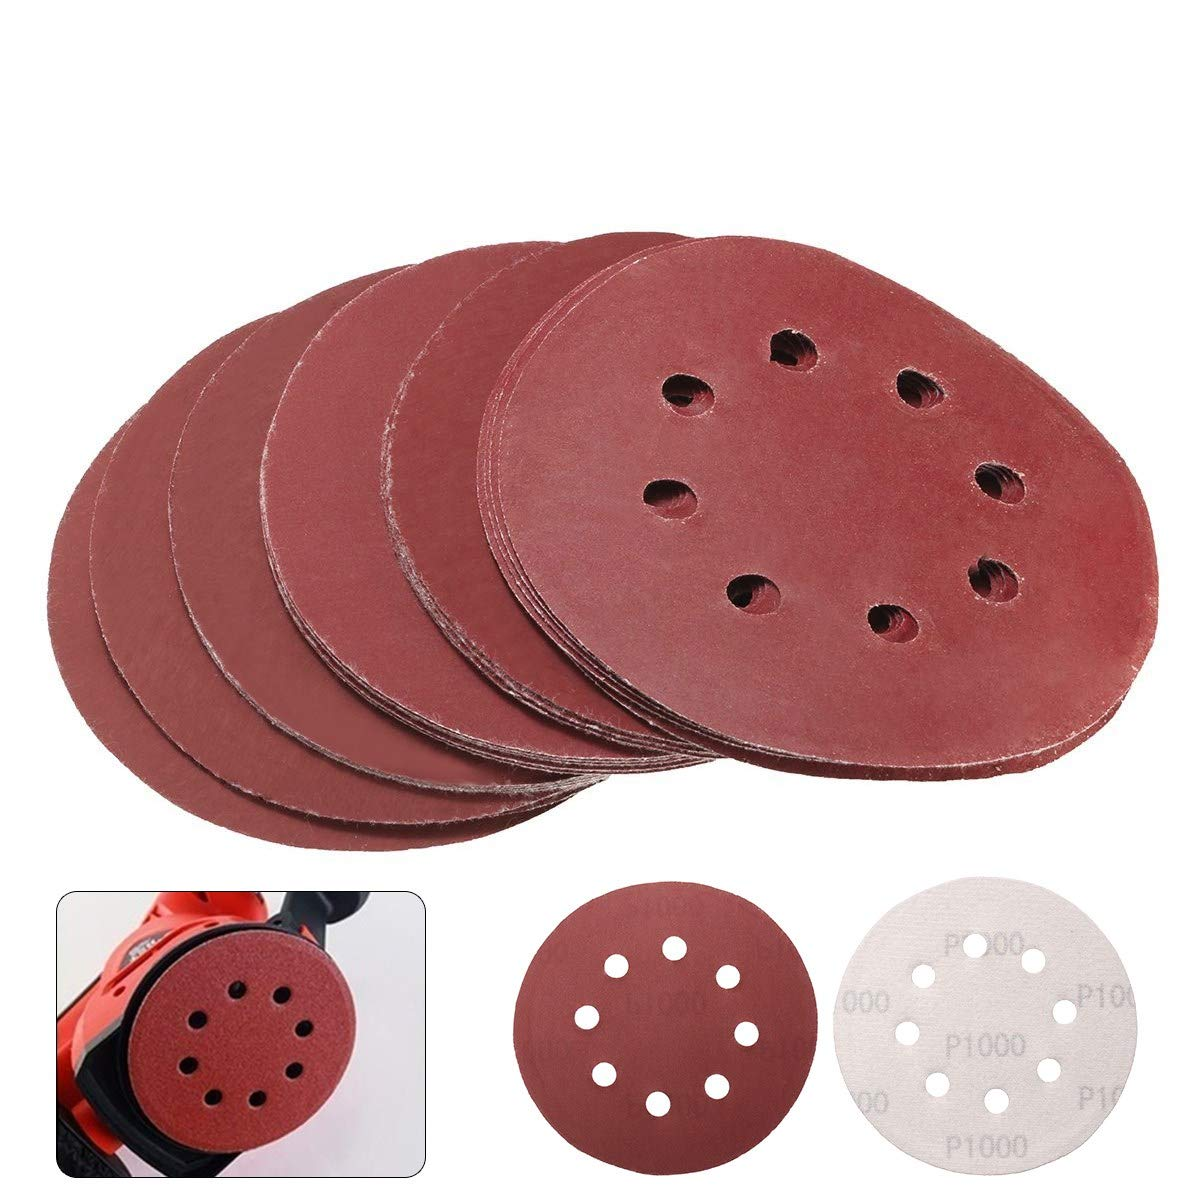 HAPYLY 5 Inch 8-Hole Hook and Loop Sanding Discs 25PCS 800 1000 1200 1500 2000 Grit Assorted Orbital Sander Round Sandpaper Tool